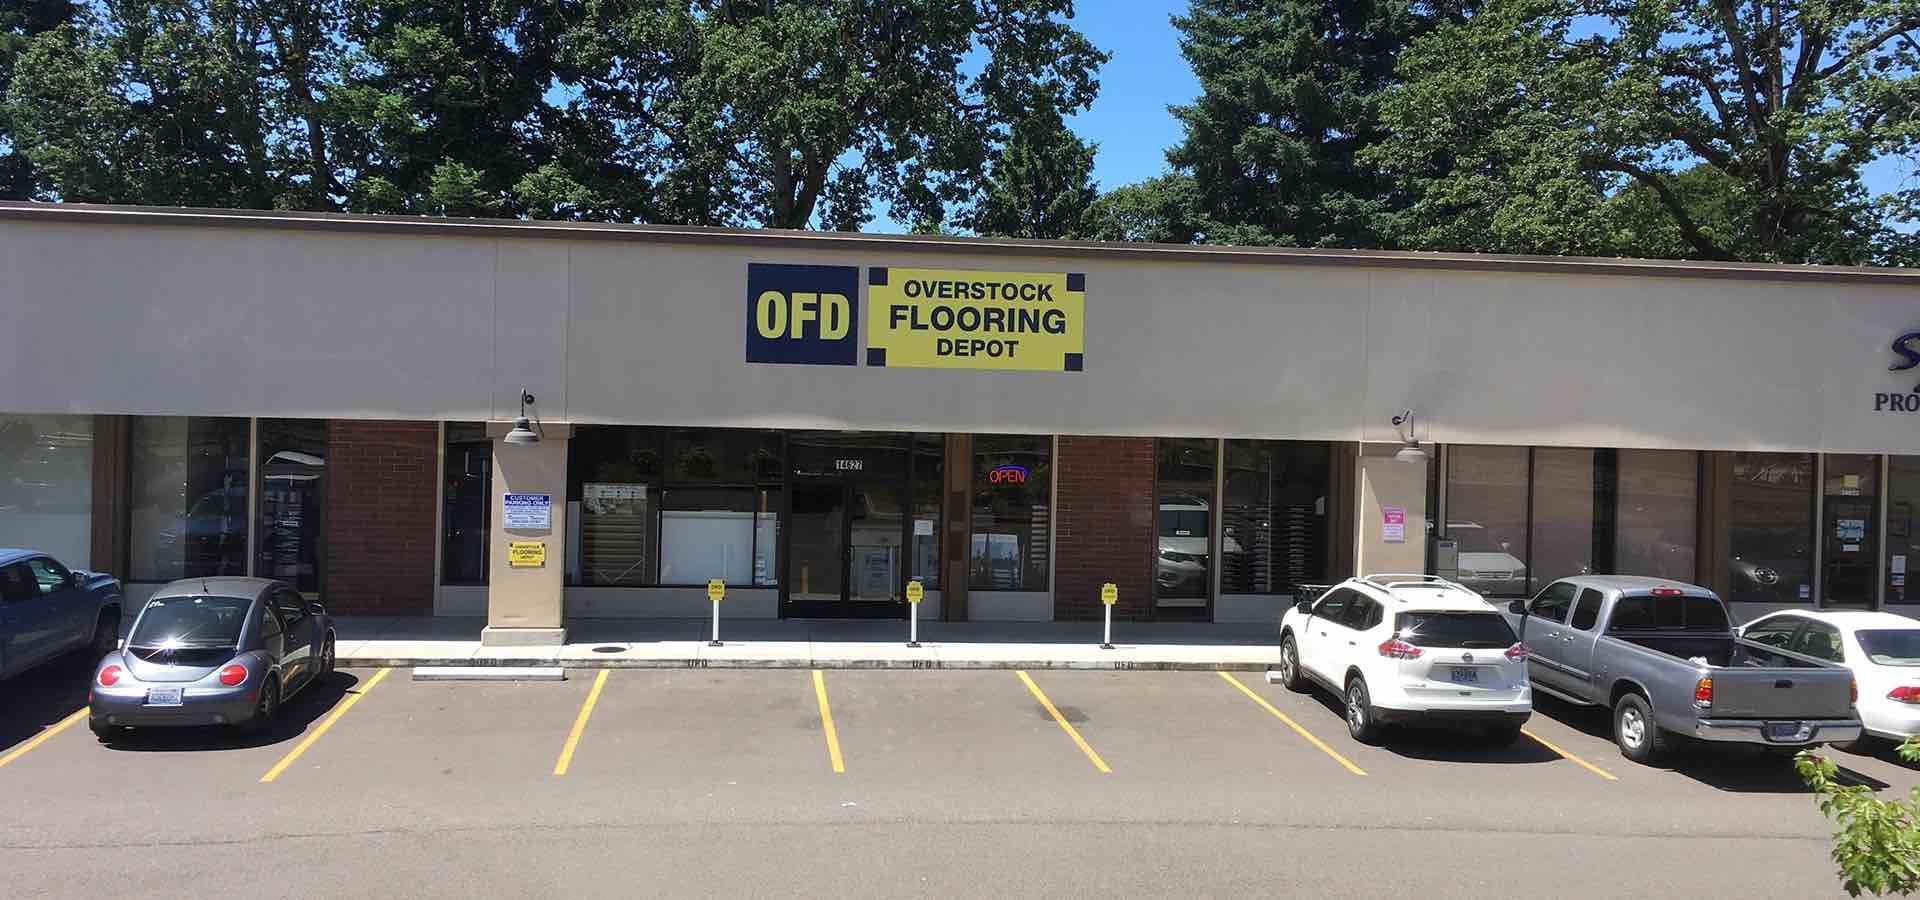 Overstock Flooring Depot